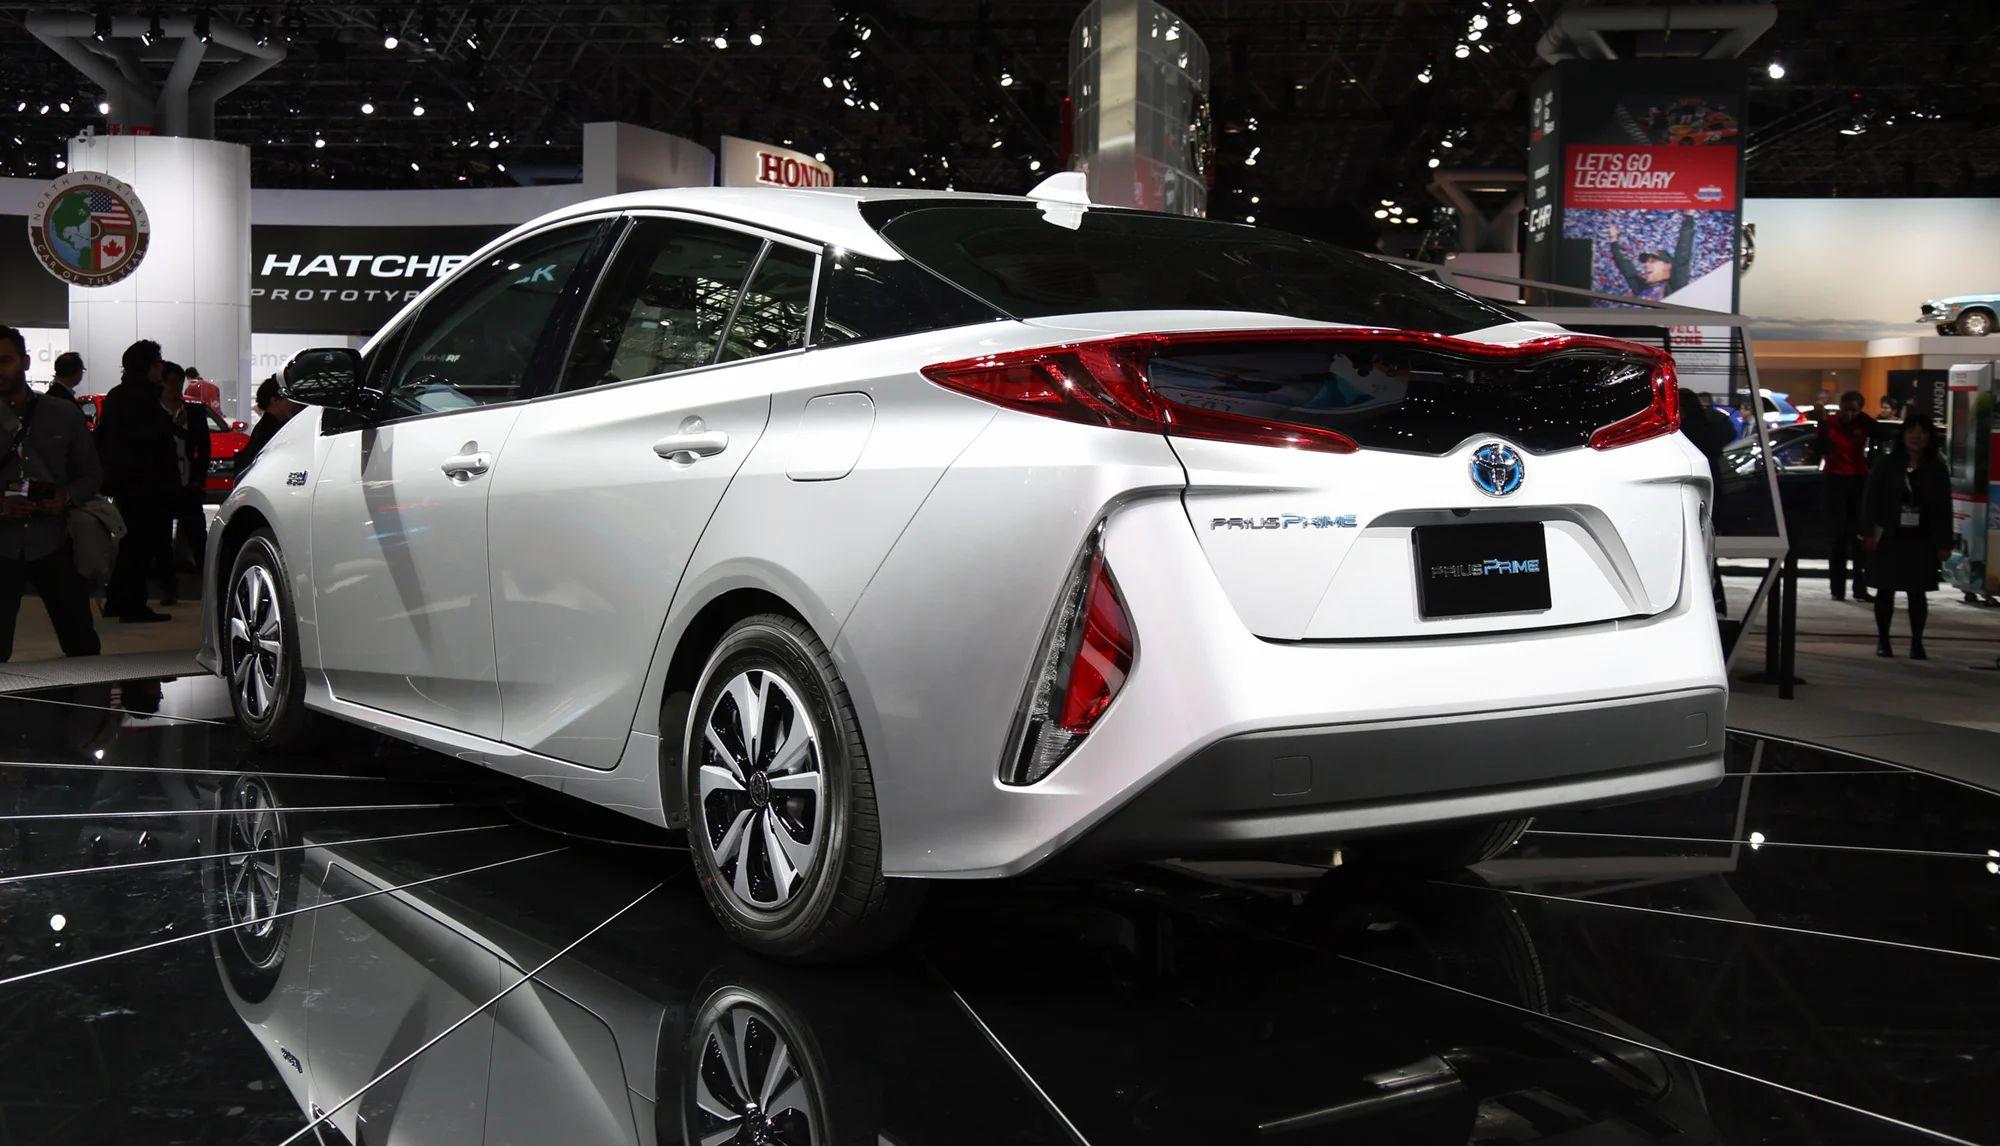 2017 toyota prius prime plug in hybrid model revealed at new york auto show